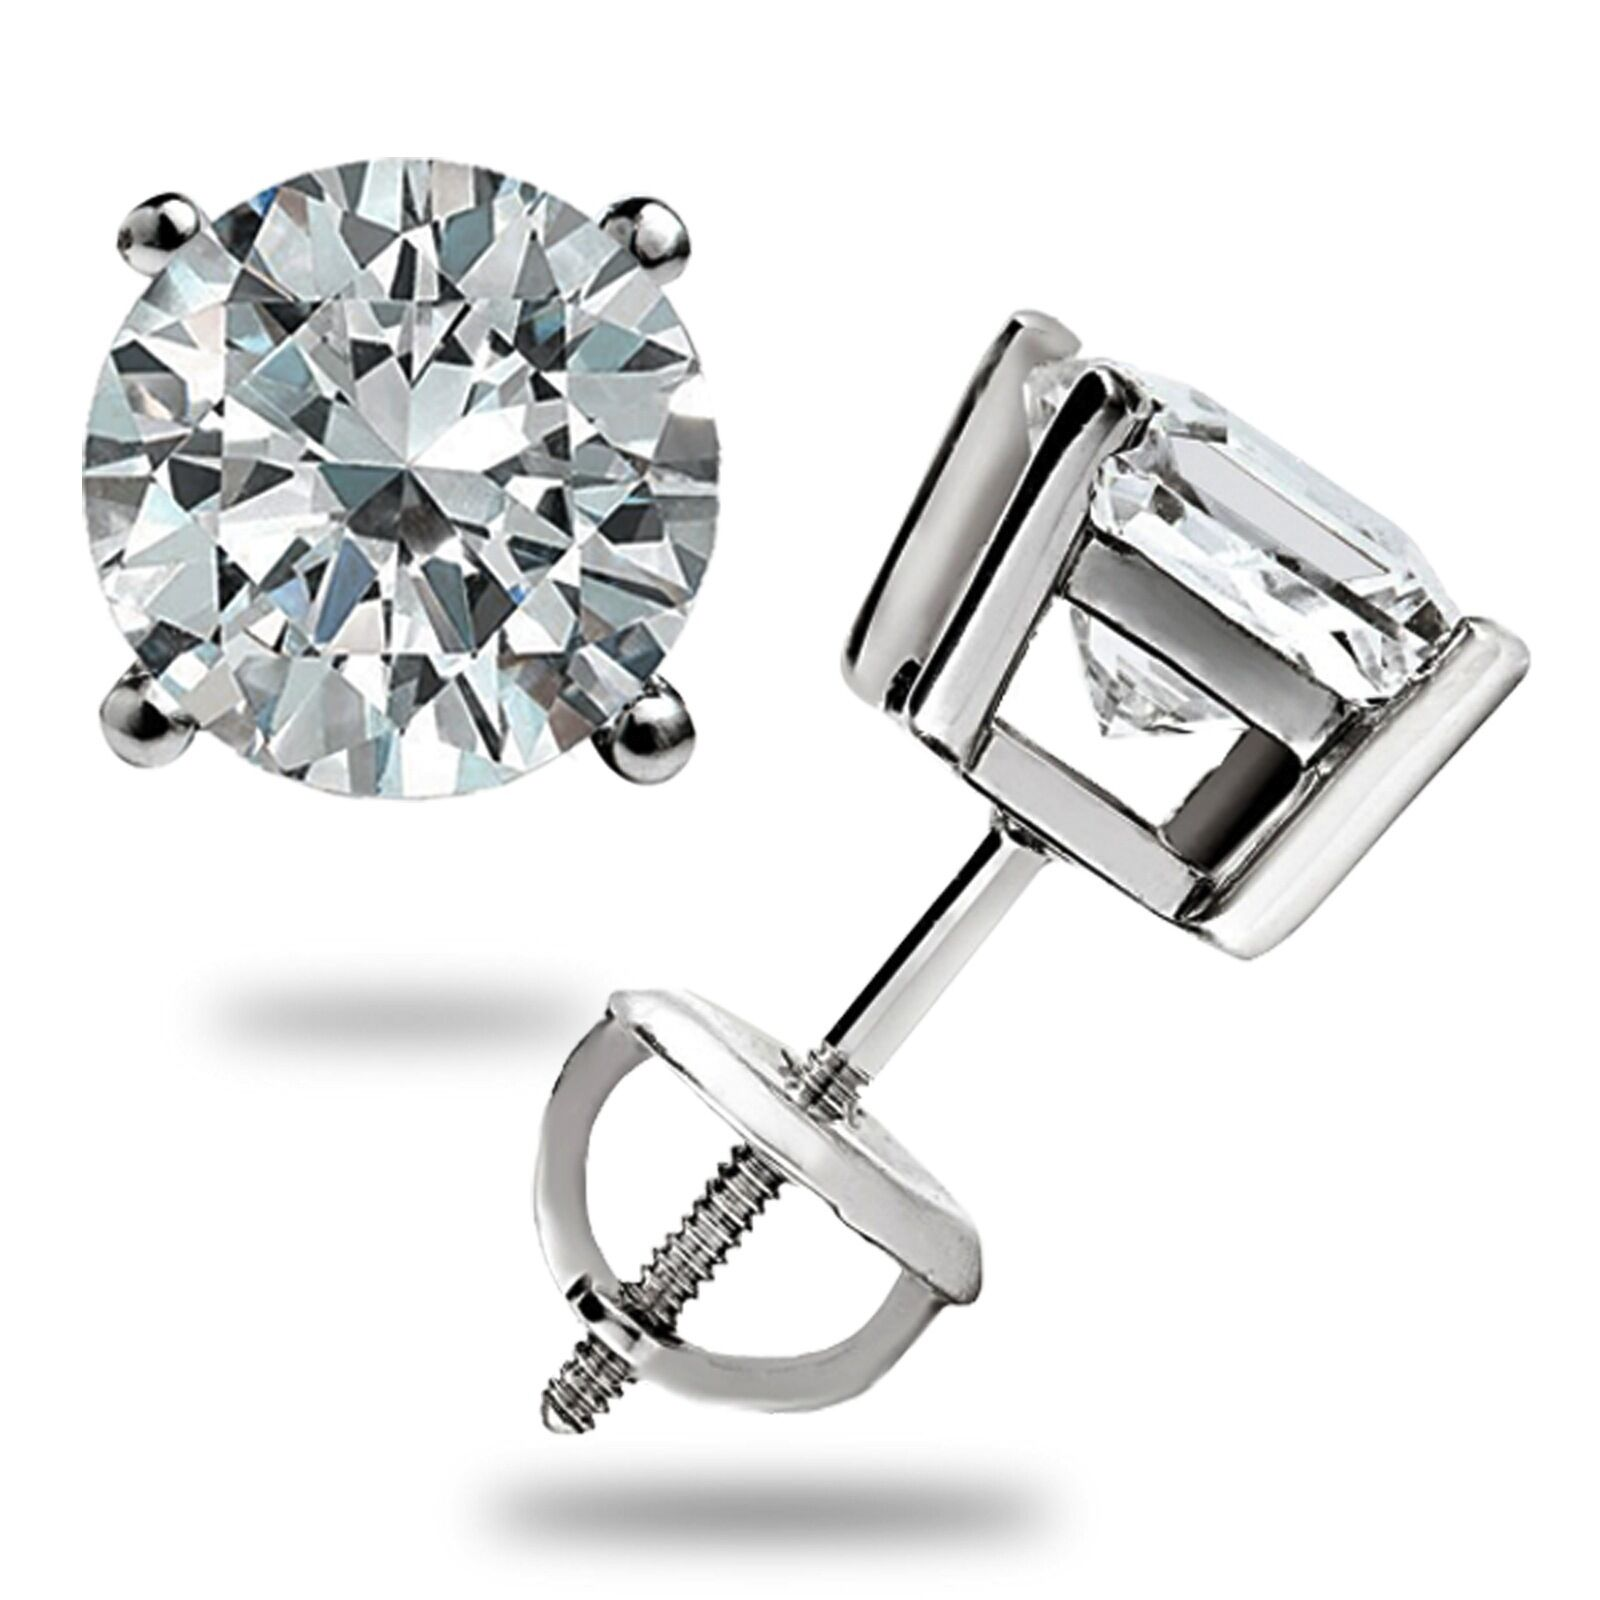 3 0 ct round cut basket screw back lab diamond earrings. Black Bedroom Furniture Sets. Home Design Ideas